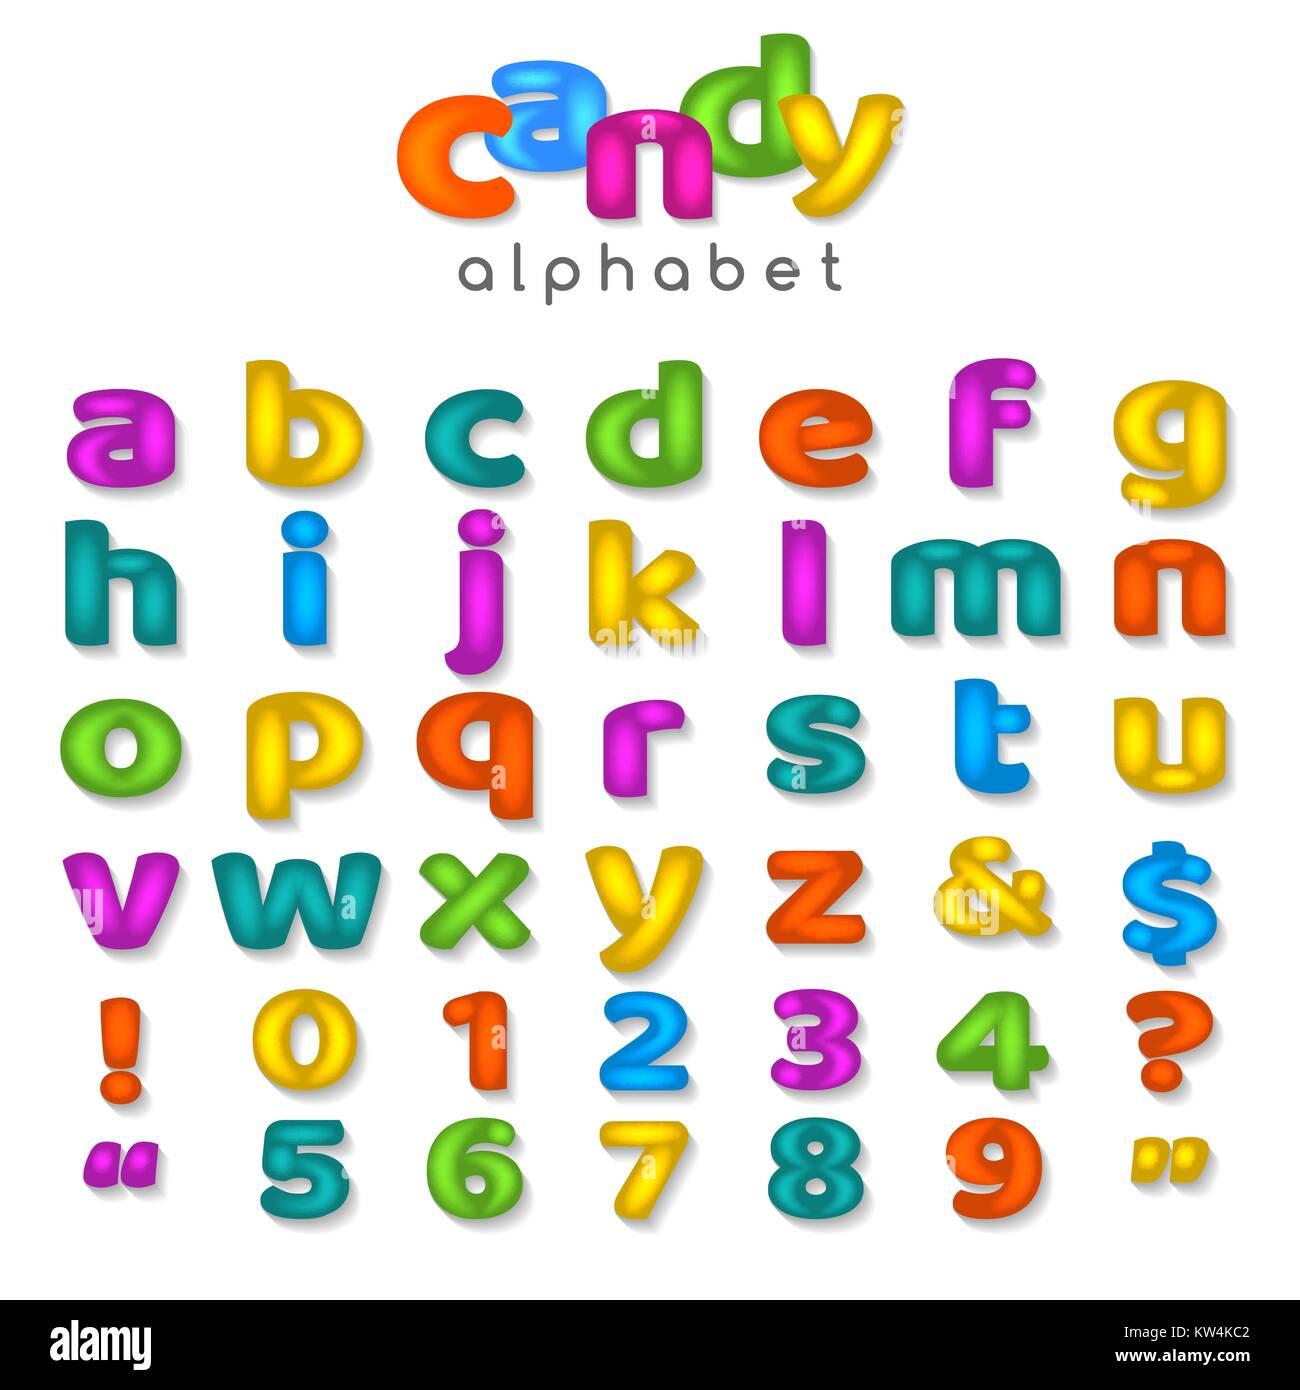 childrens font microsoft word